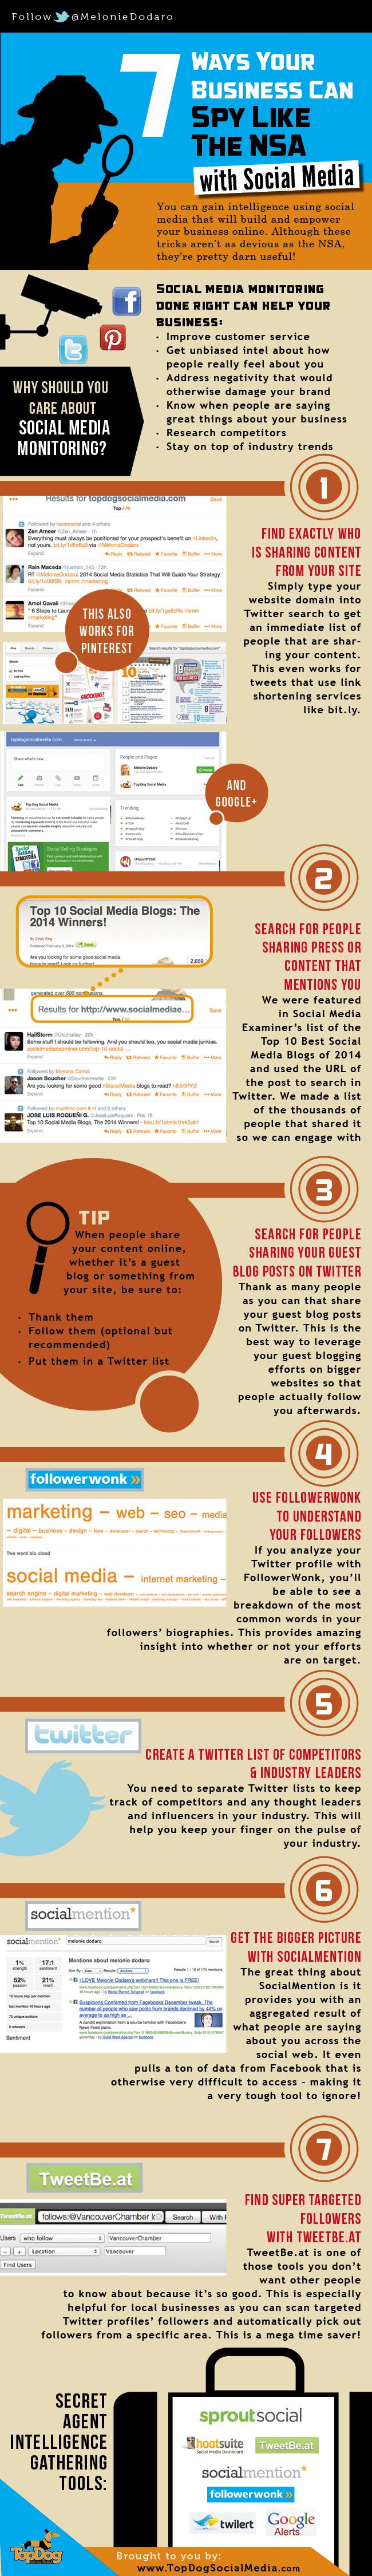 Social-Media-Monitoring-Infographic